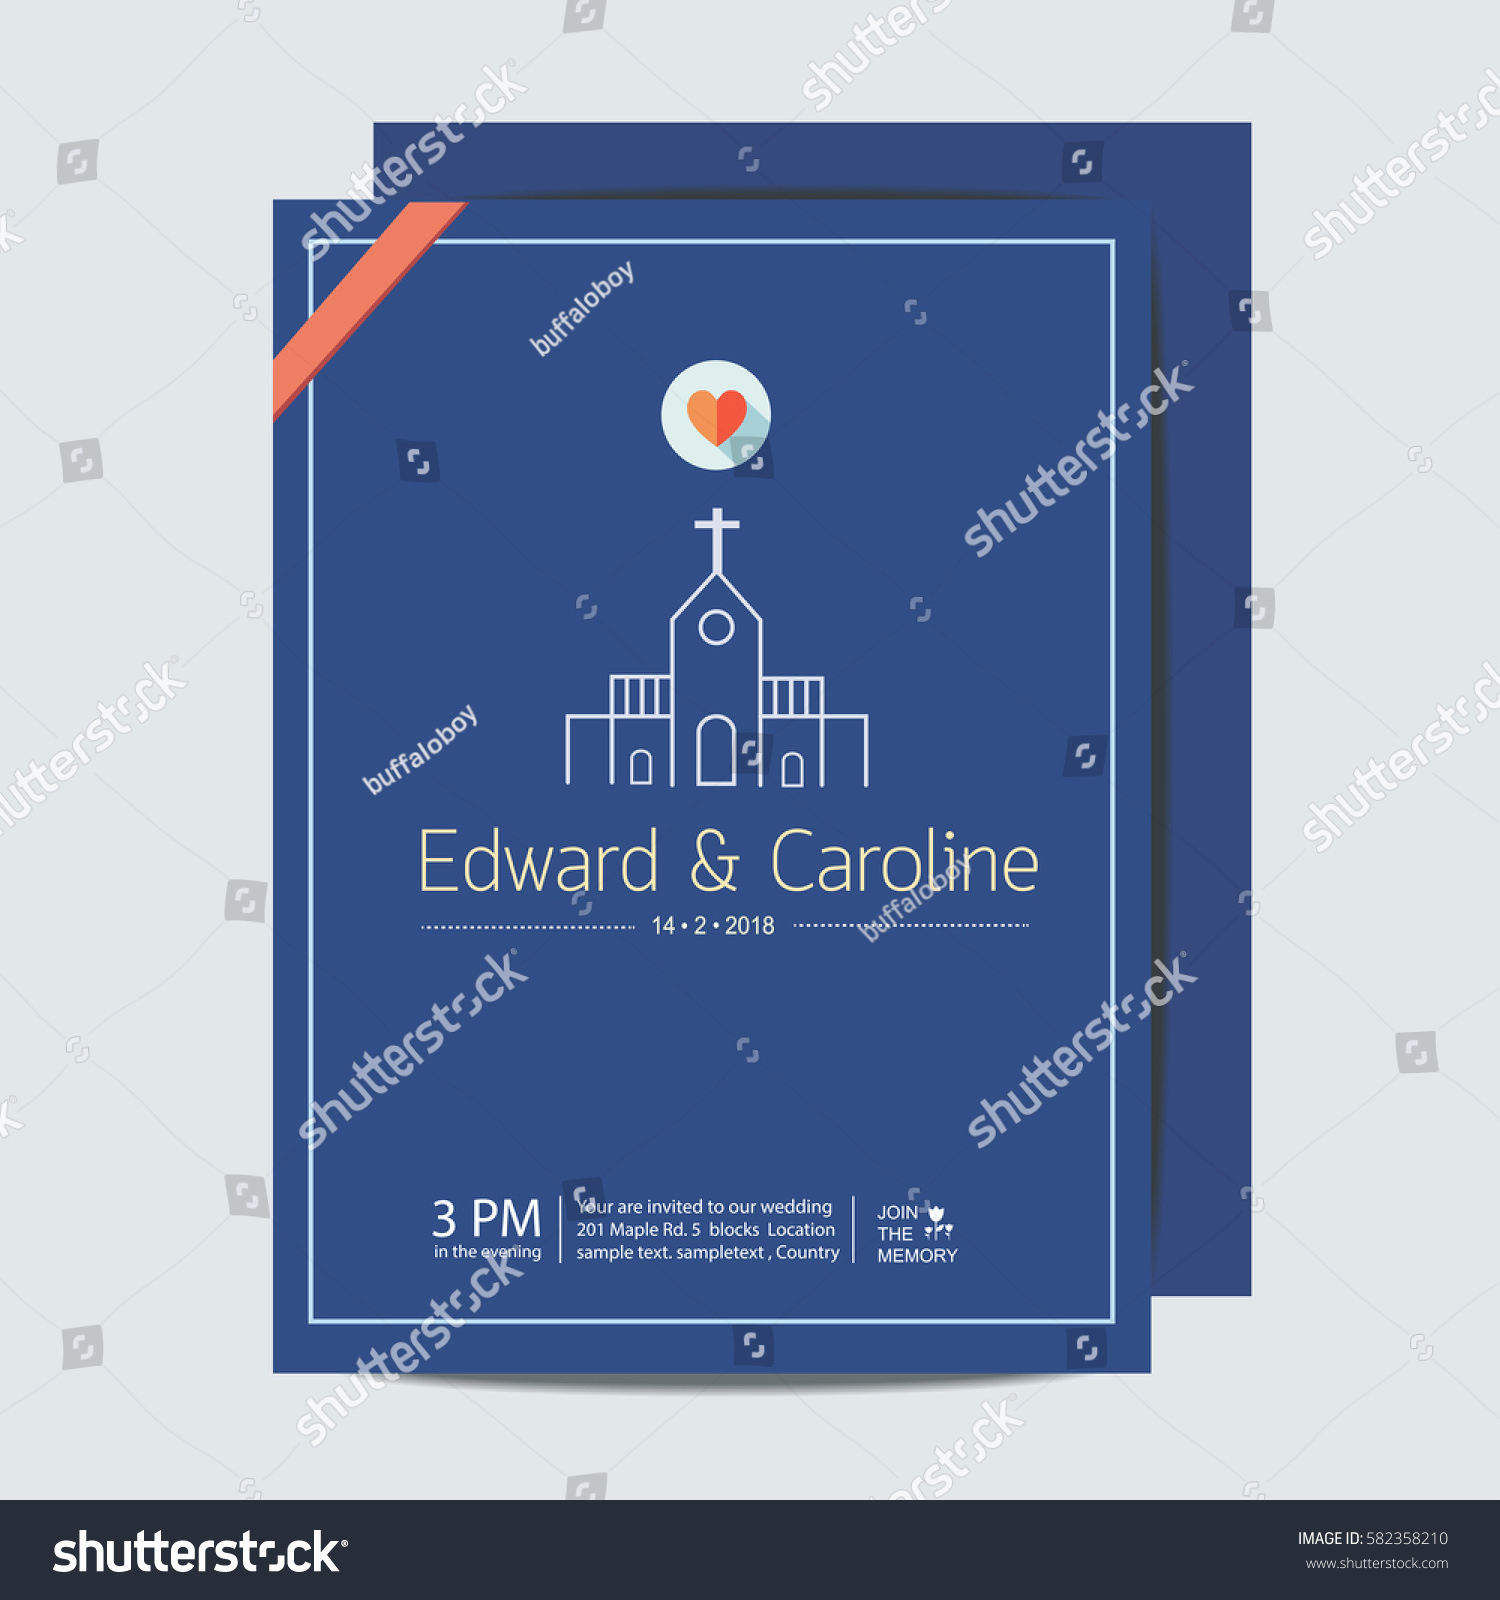 Church Invitation Cards Templates Elegant Church Invitation Templates Yourweek B5bdb8eca25e